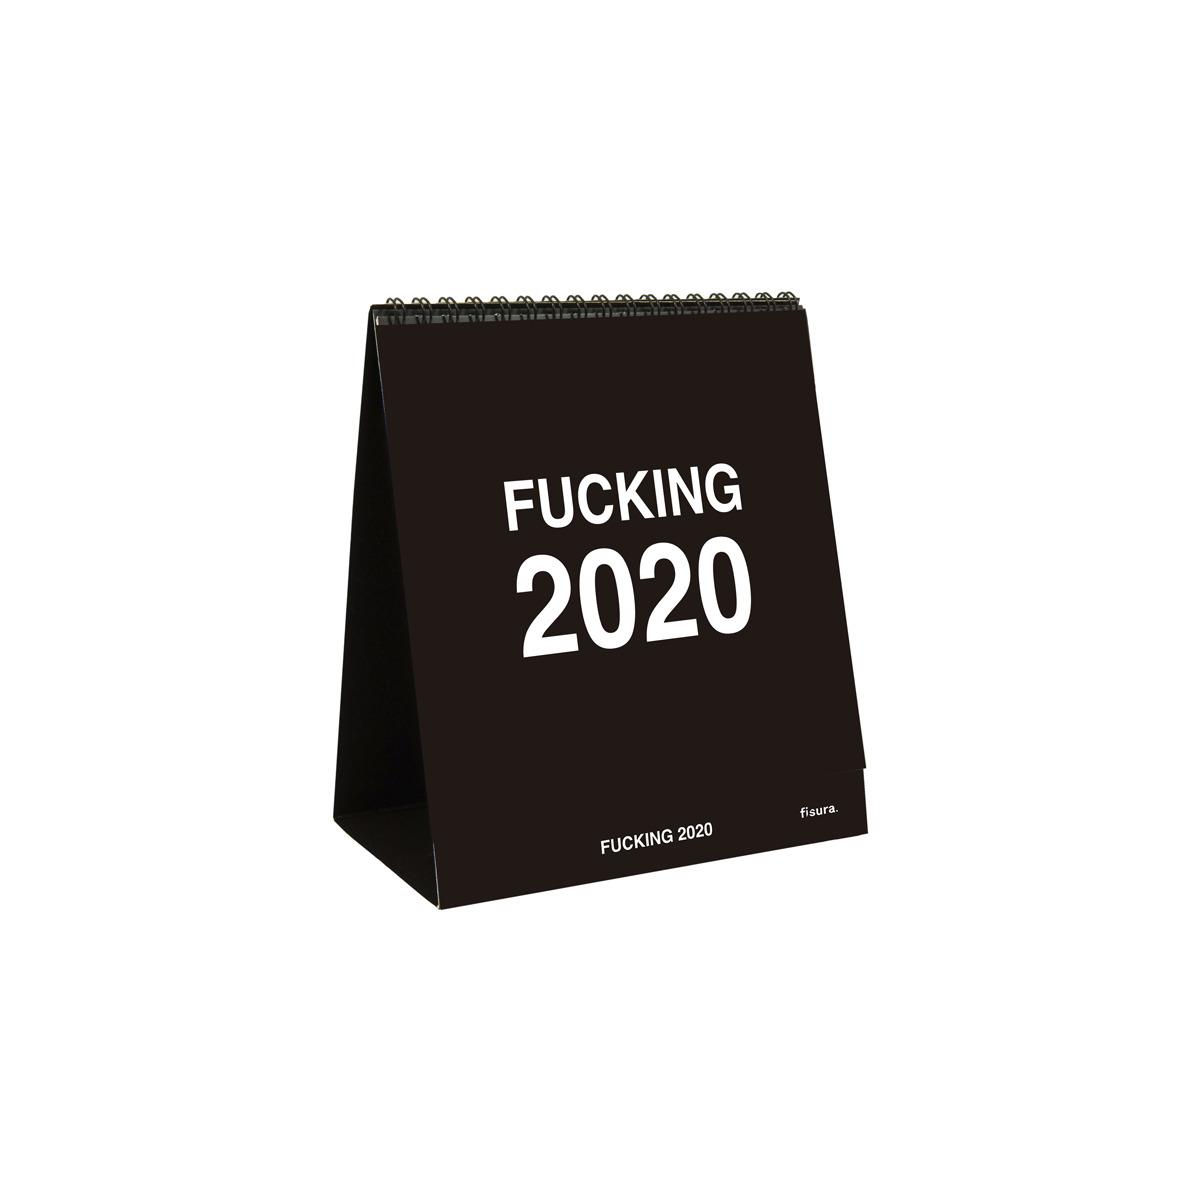 295444-kozPR.jpg